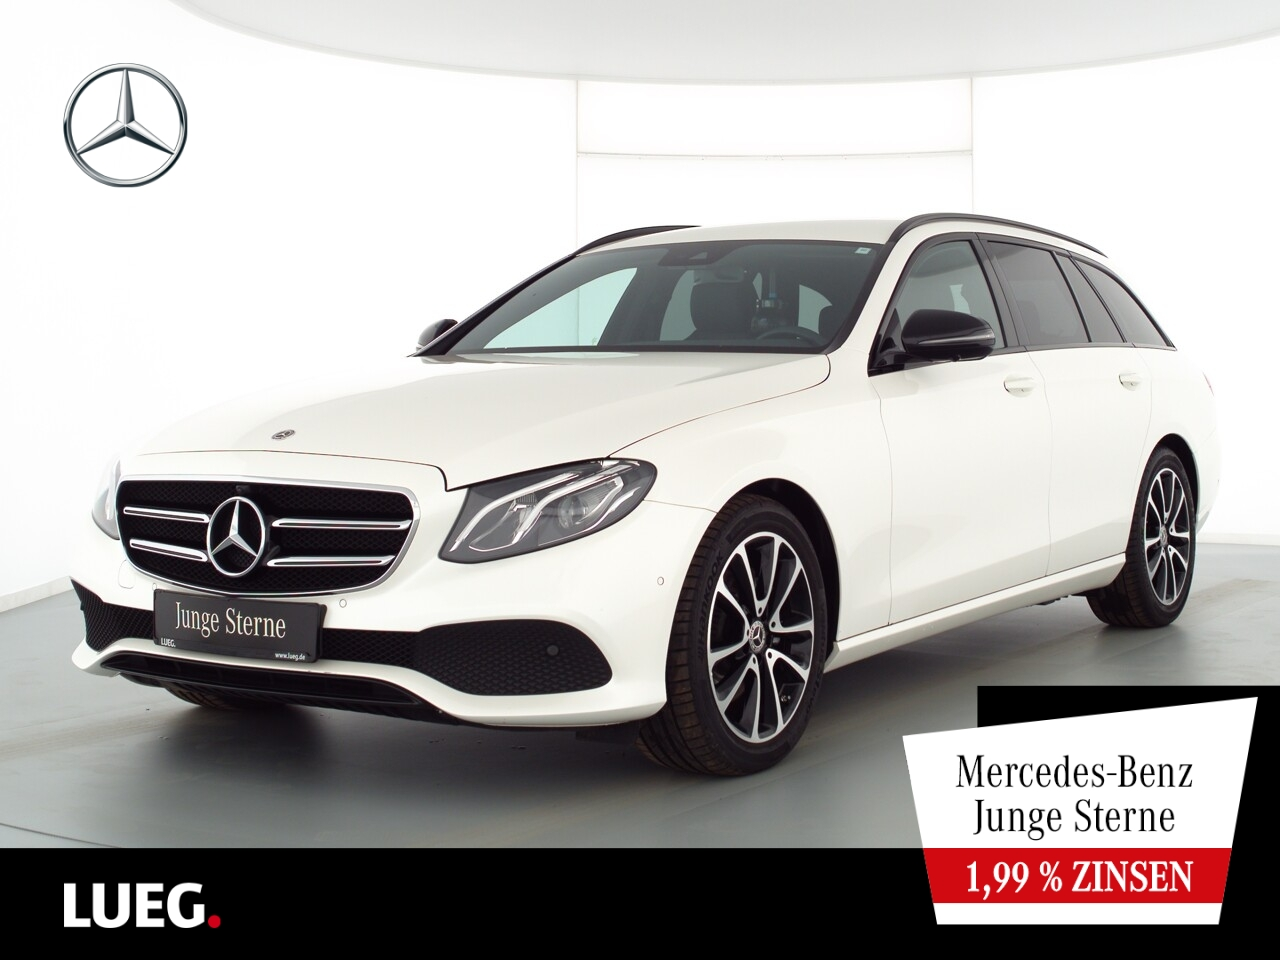 Mercedes-Benz E 220 d T Avantgarde+COM+LED-HP+Widesc+Night+360, Jahr 2019, Diesel